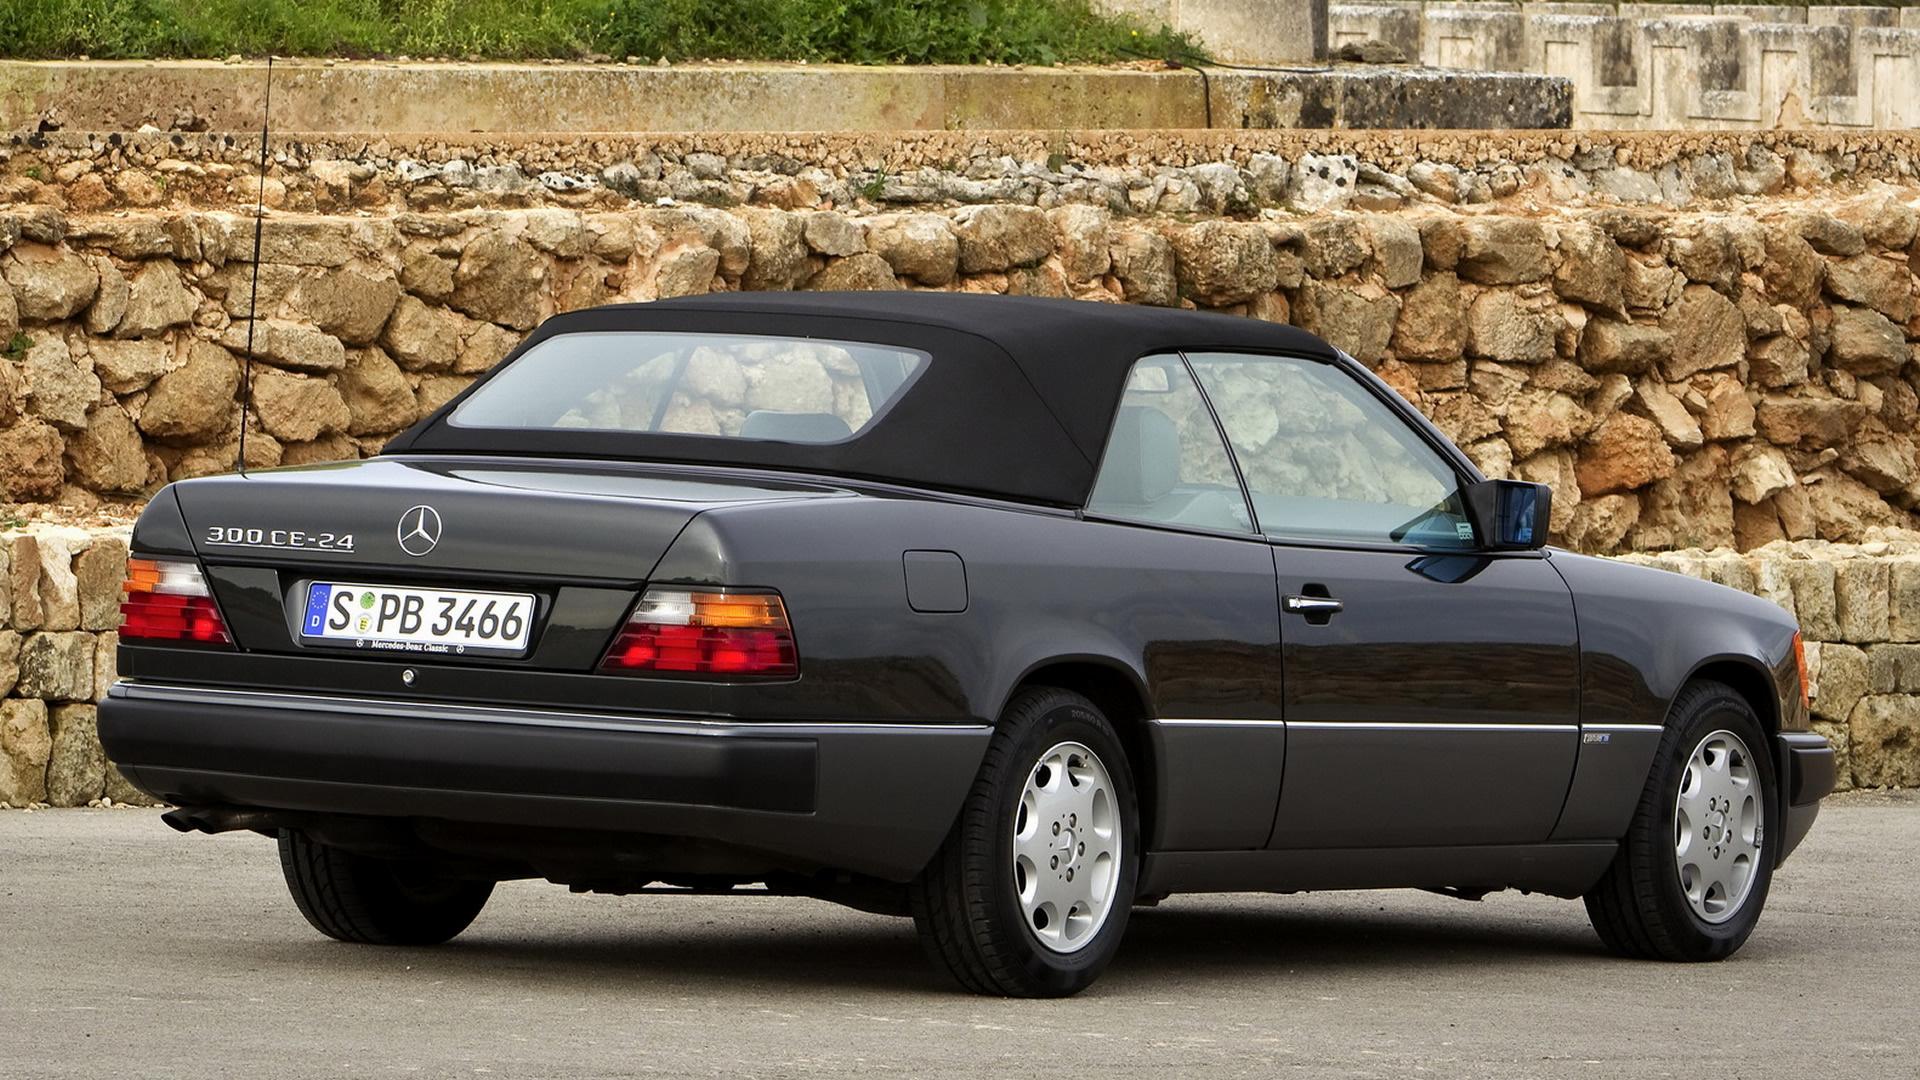 Black Car Car Convertible Luxury Car Mercedes Benz 300 Ce 24 Cabriolet 1920x1080